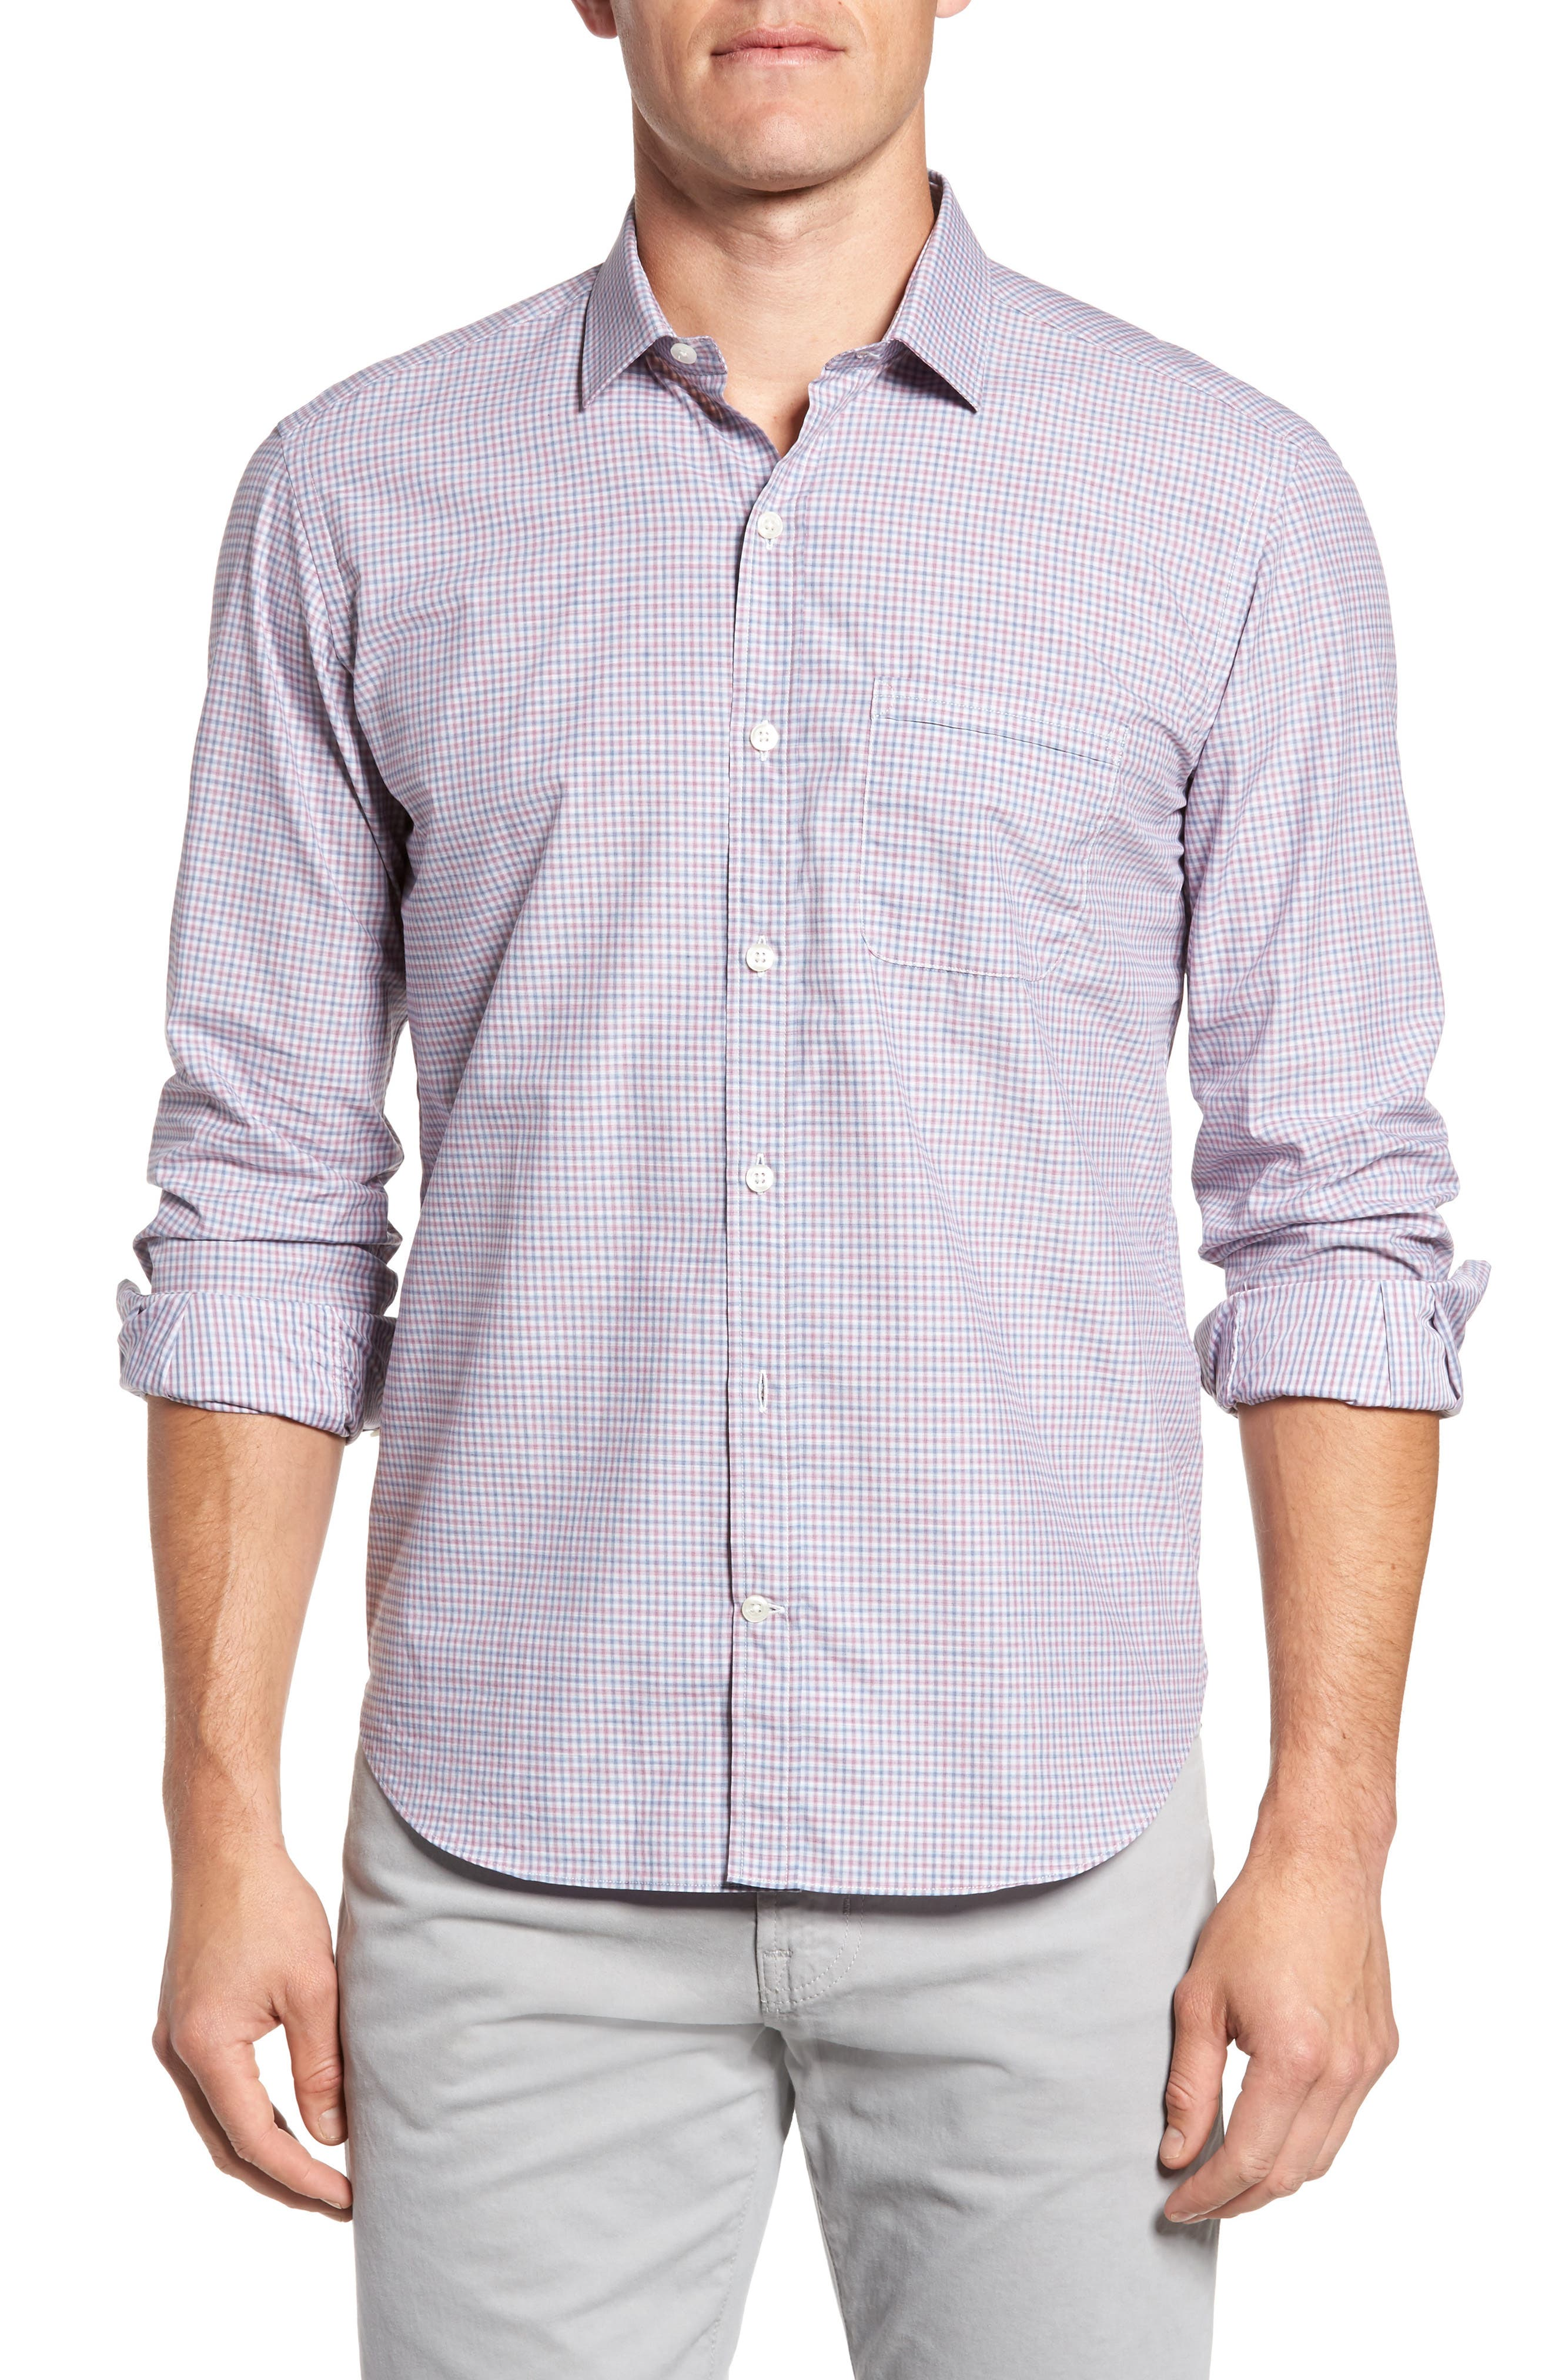 Main Image - Culturata Trim Fit Mini Plaid Sport Shirt